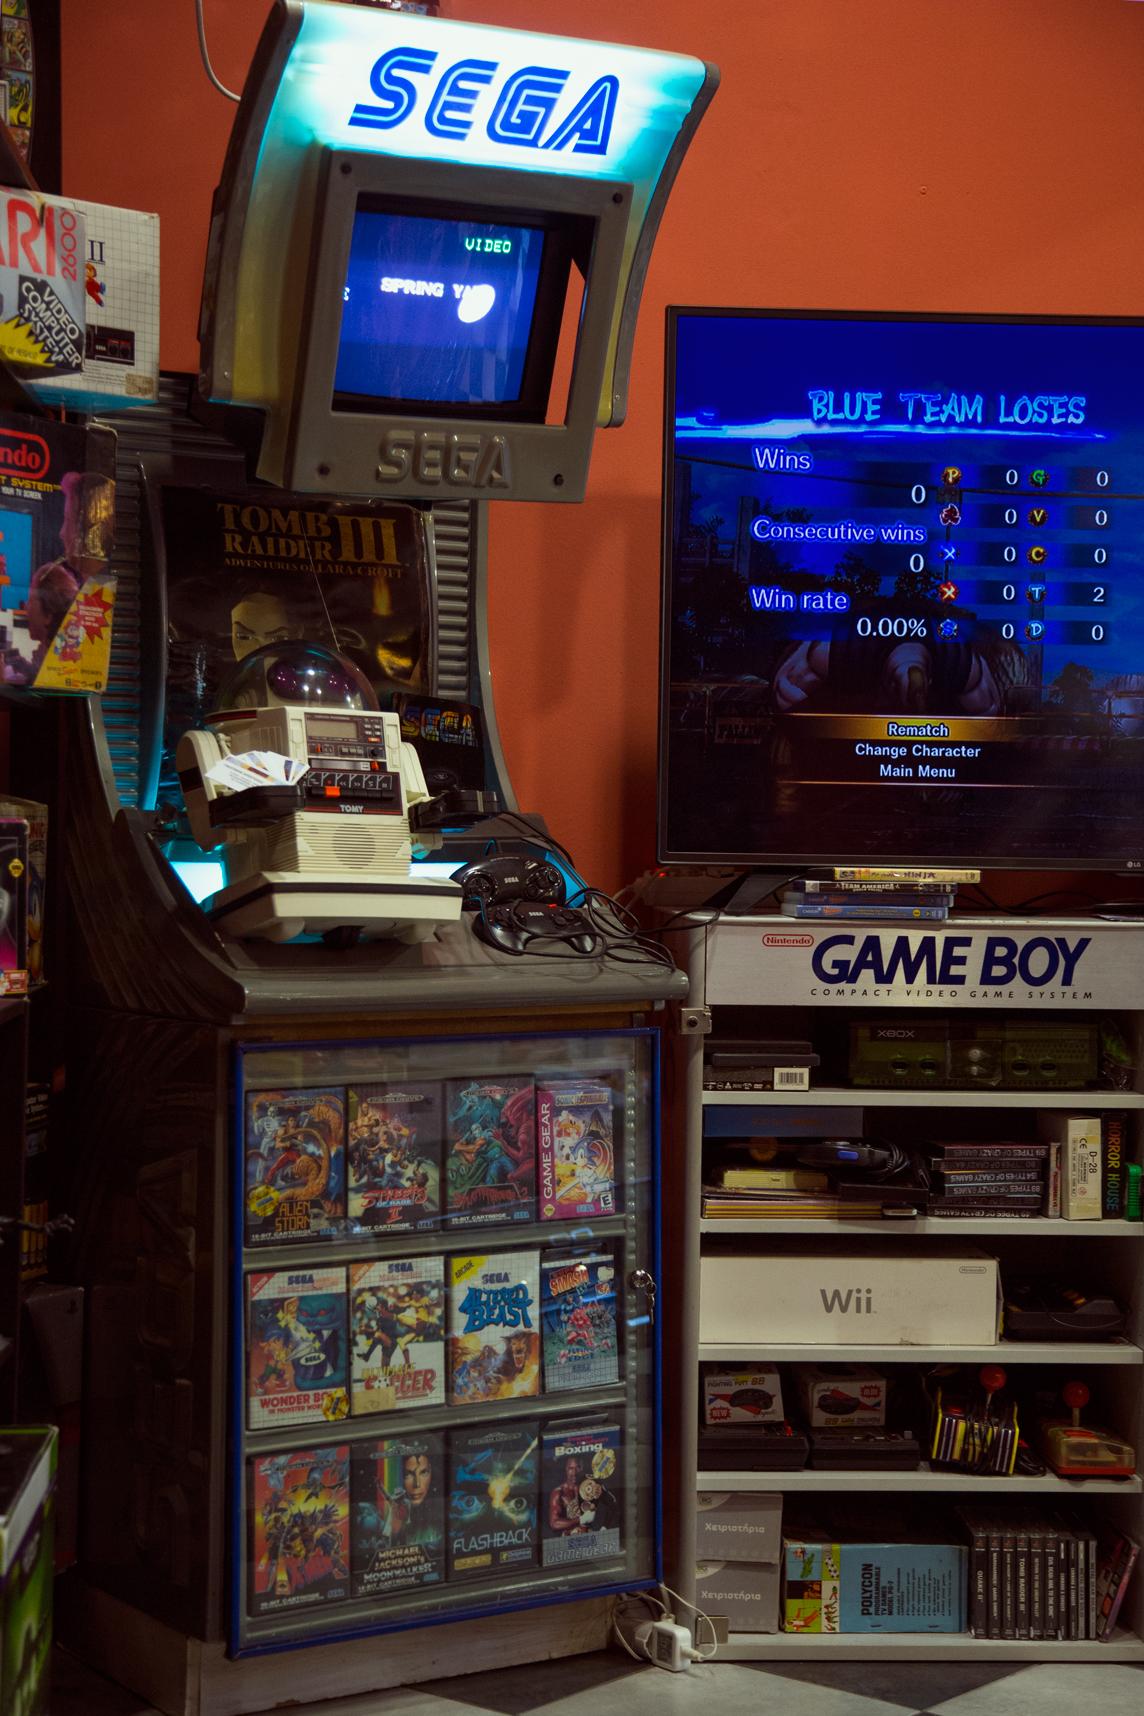 To Sega μόλις έκανε reboot -έφυγε ένα διπλό στα γρήγορα